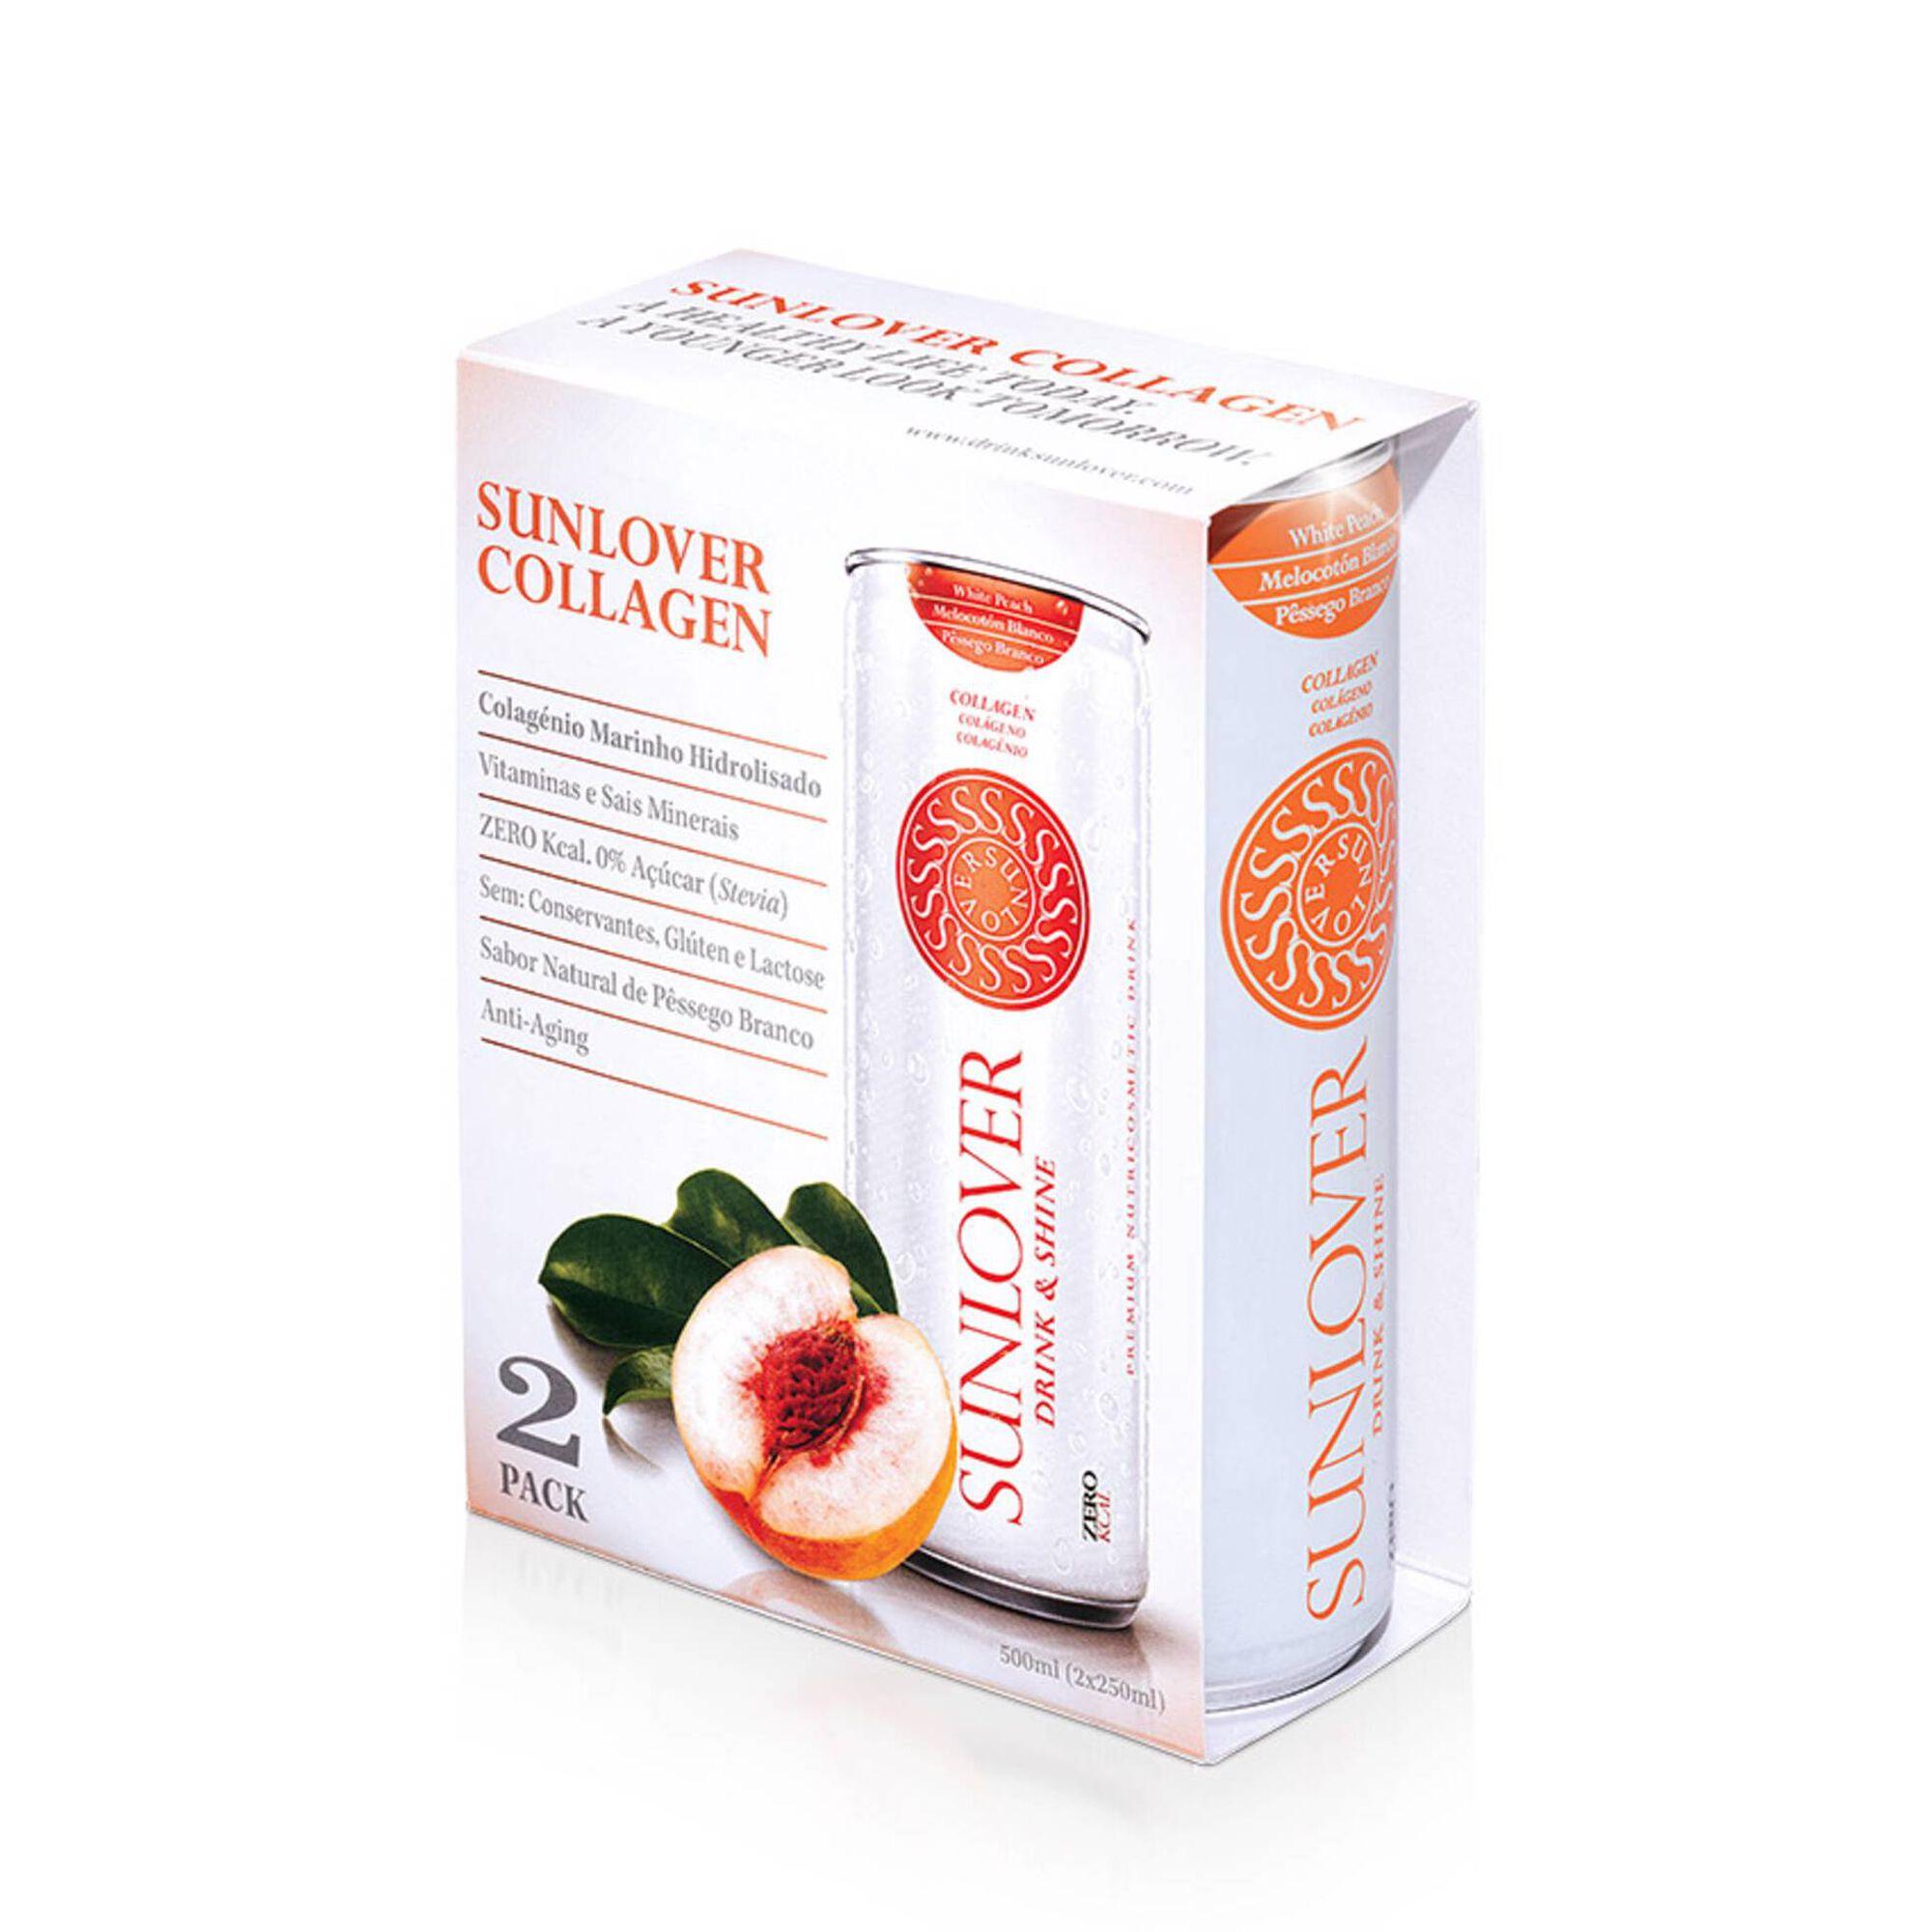 Sunlover Collagen, , hi-res